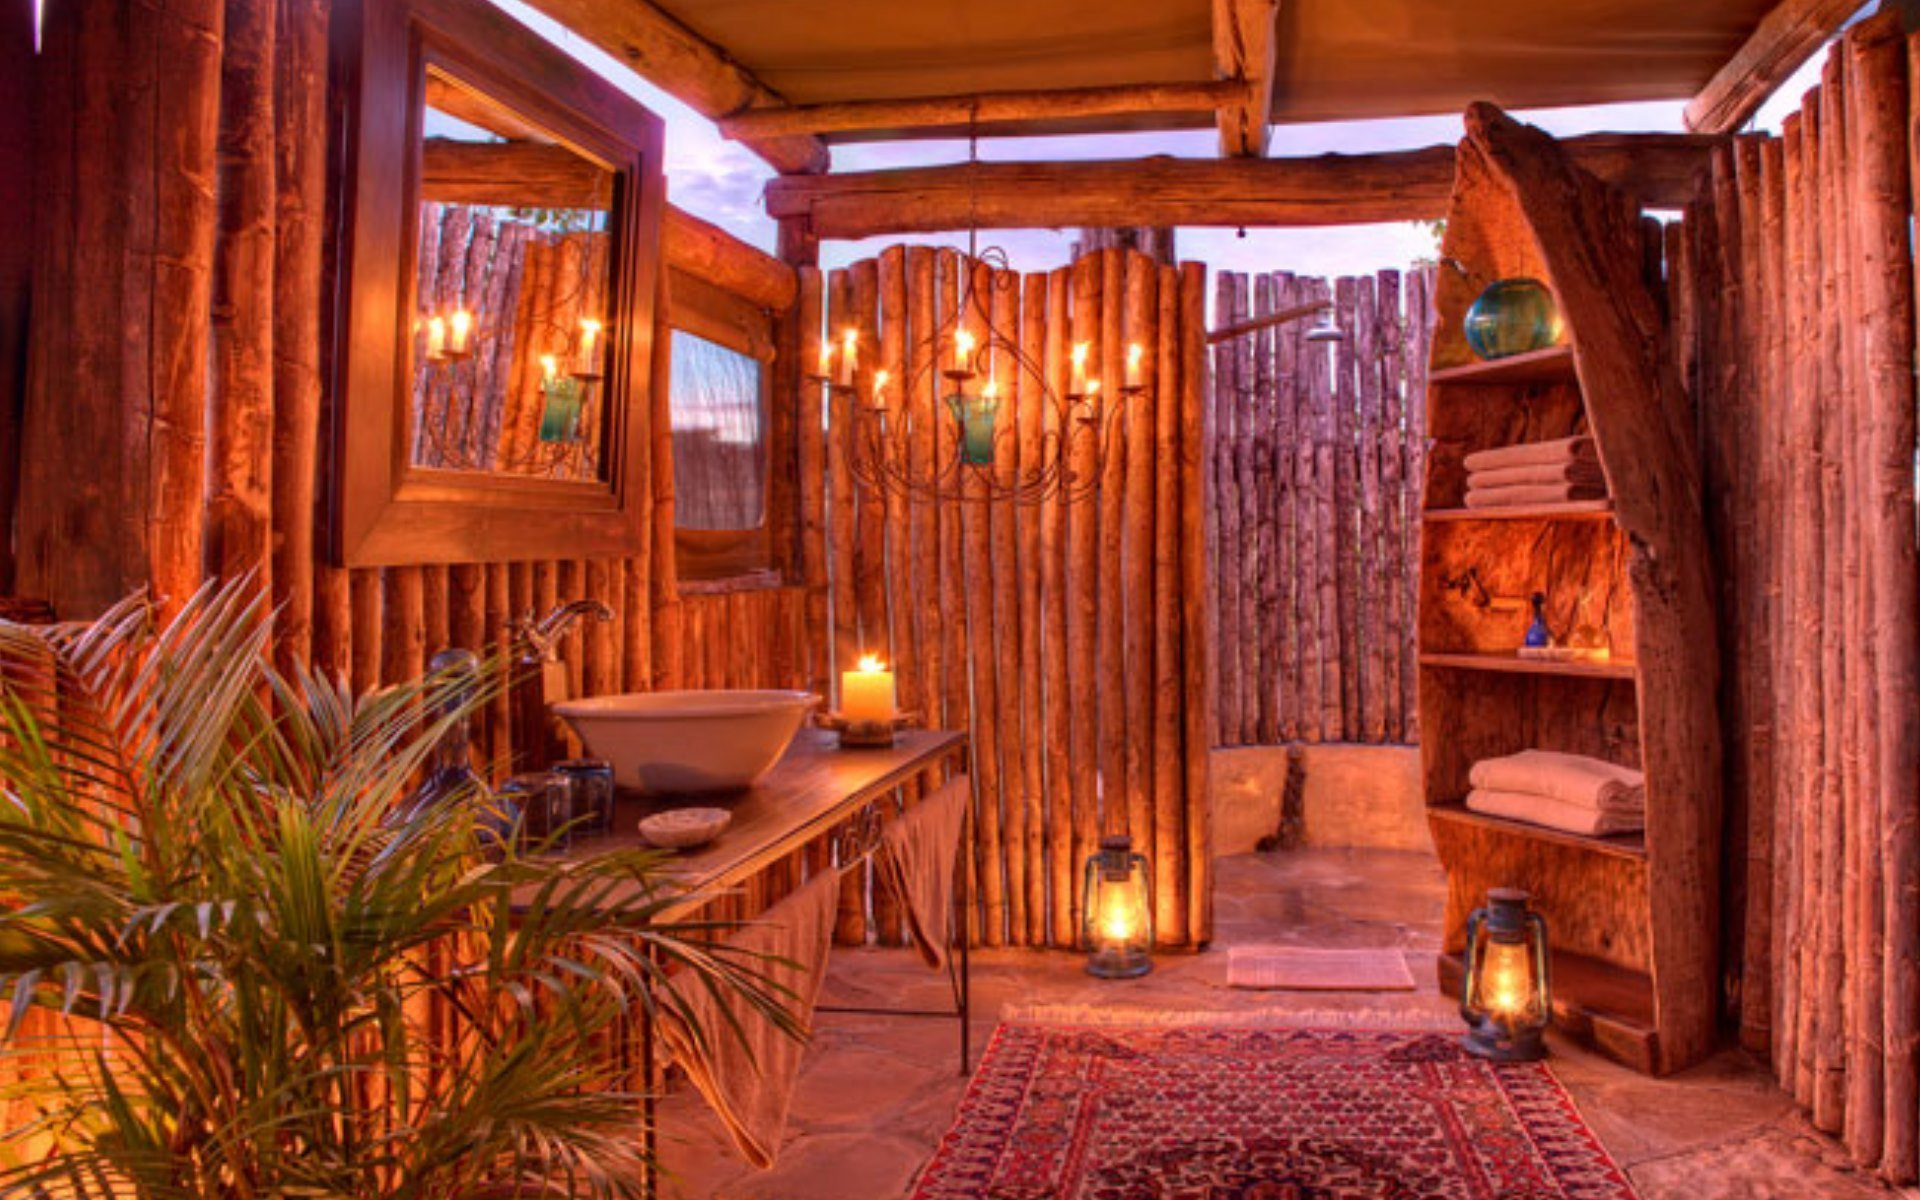 5 boutique safari camps in Kenya to unwind In: Richard's Camp Mara